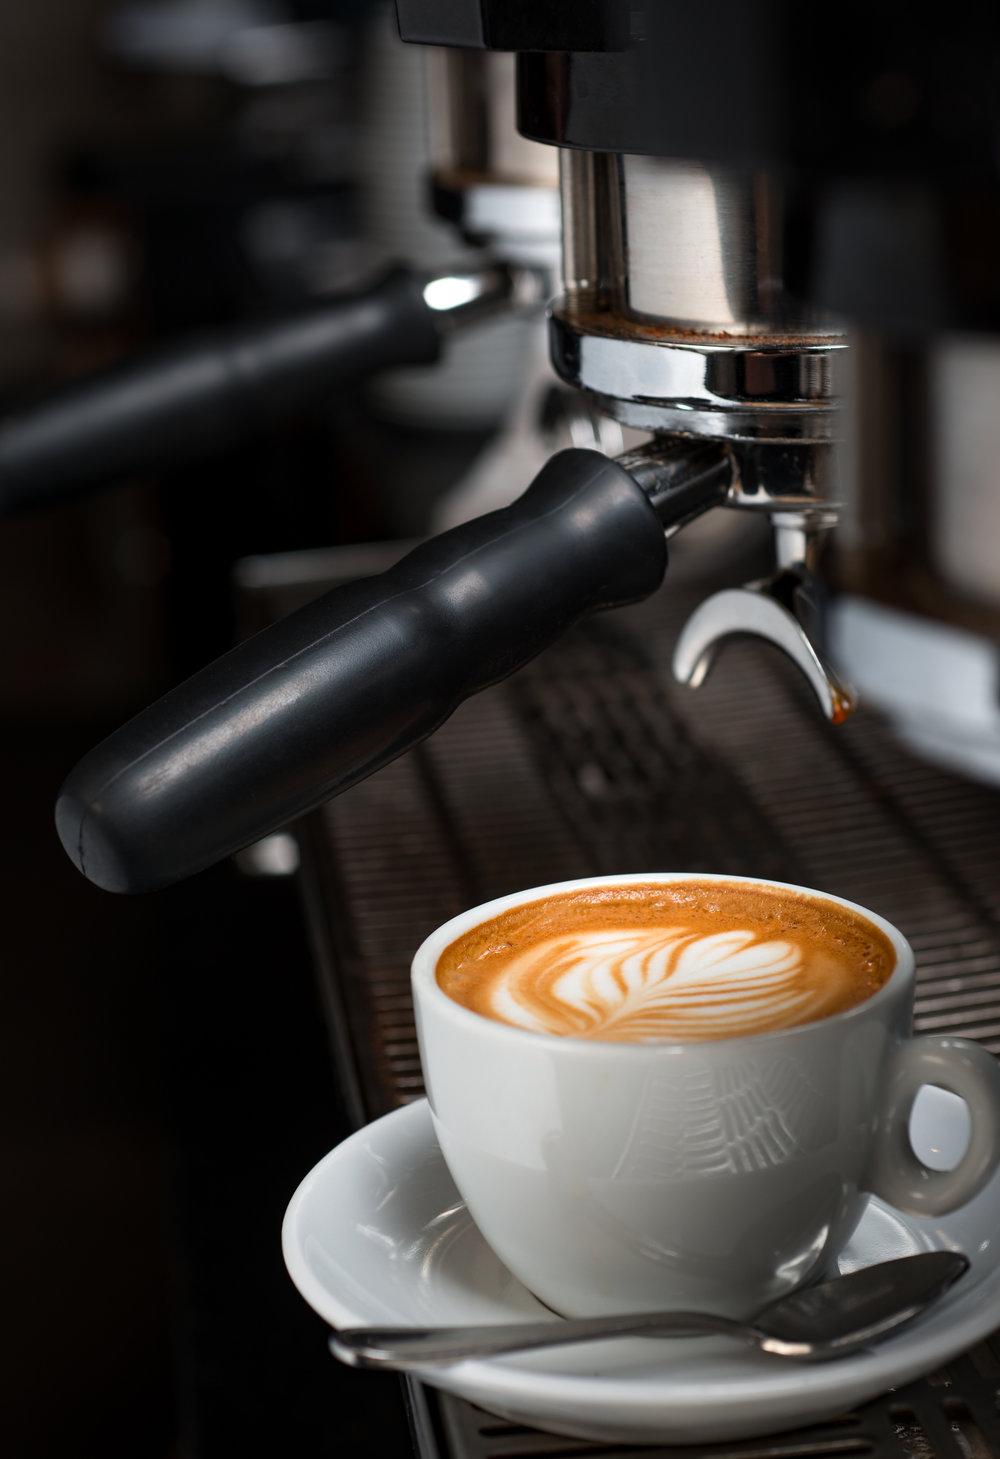 Coffee-onEspressoMachine.jpg